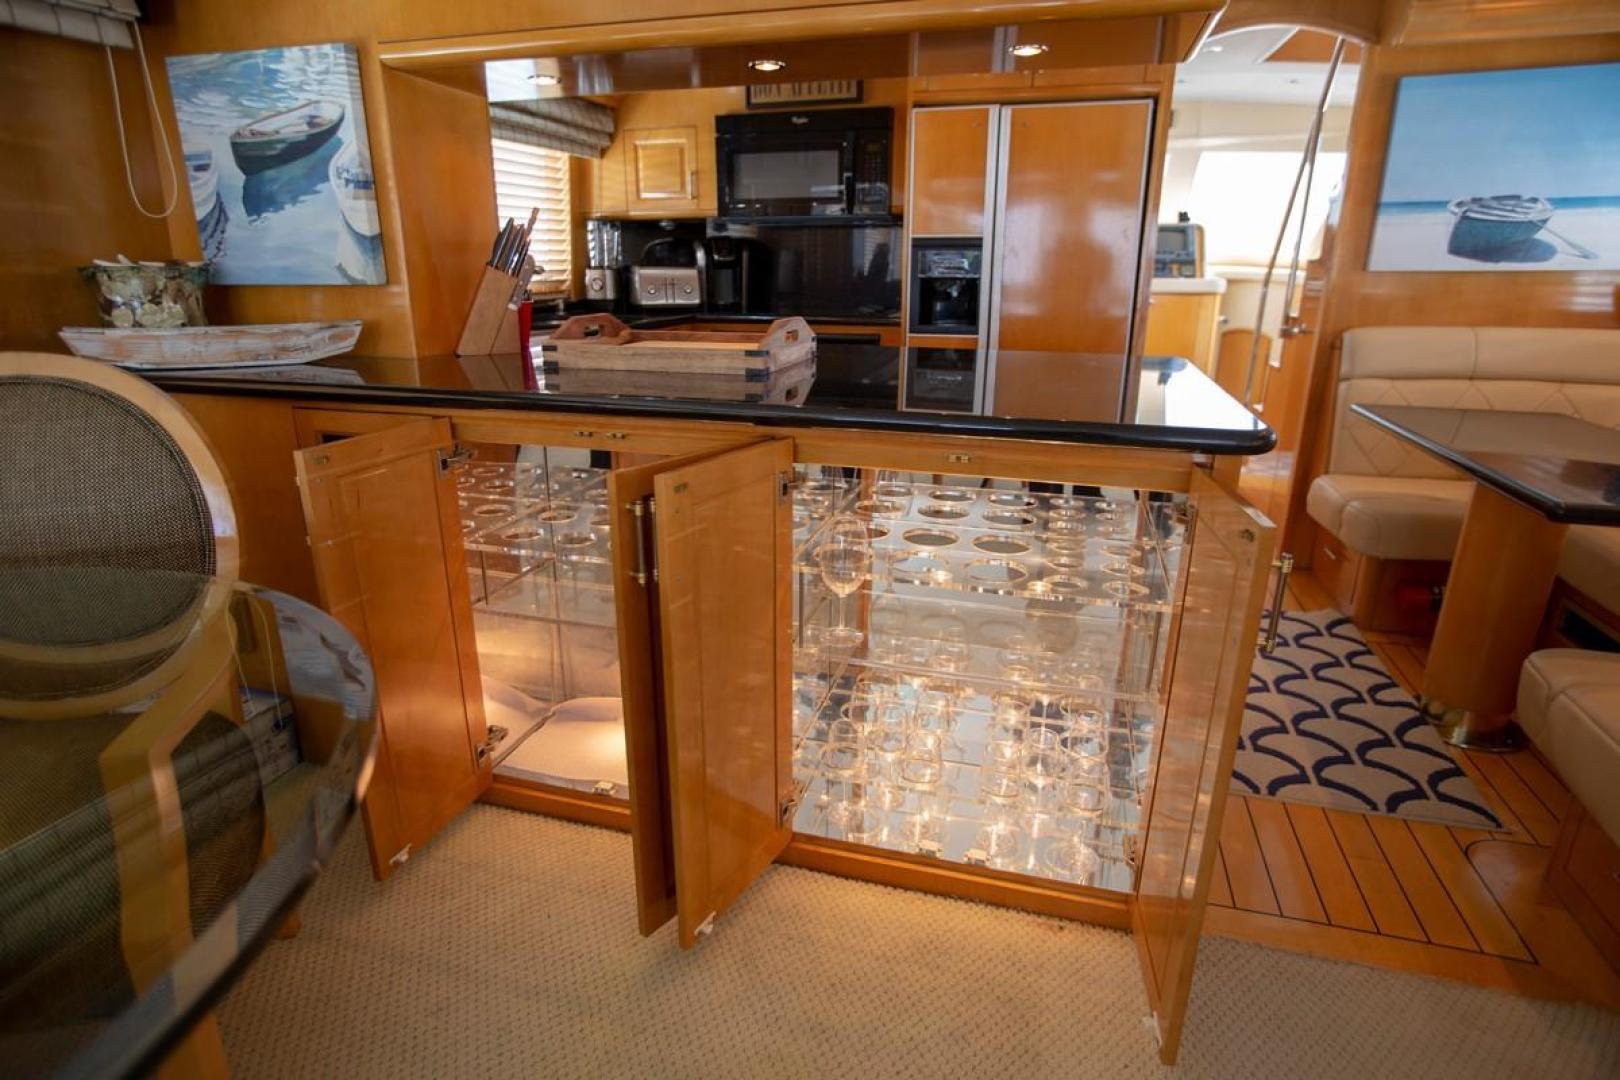 Hatteras-Cockpit Motor Yacht 2000-Getaway Ft. Lauderdale-Florida-United States-977365 | Thumbnail